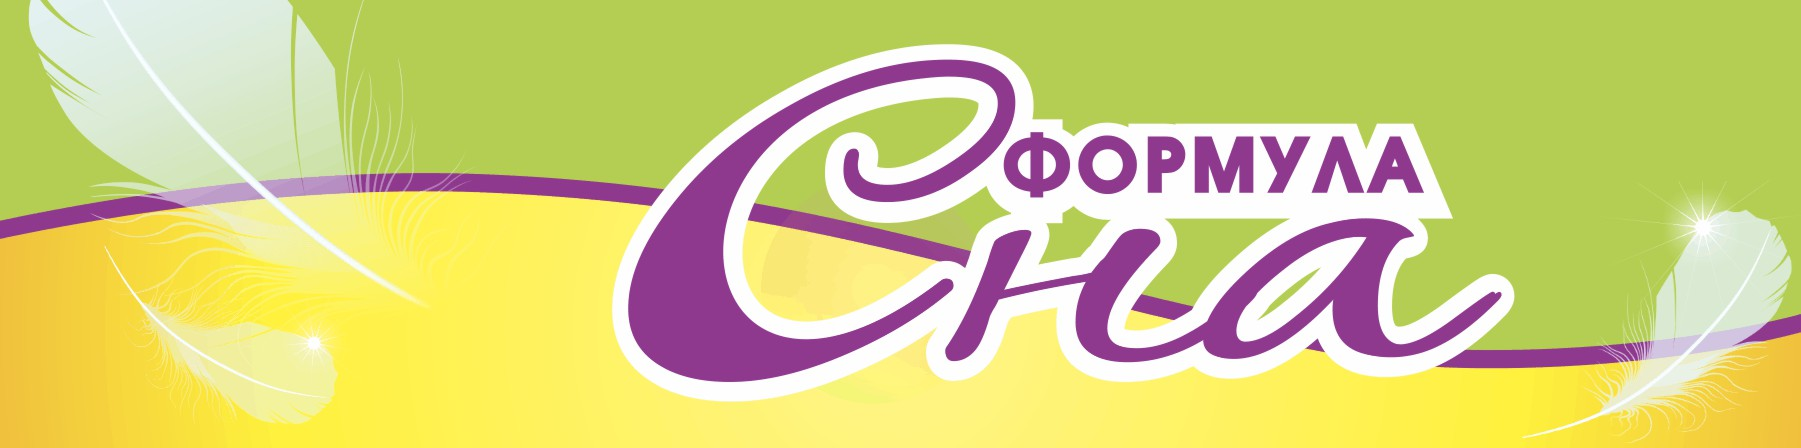 Логотип формула сна